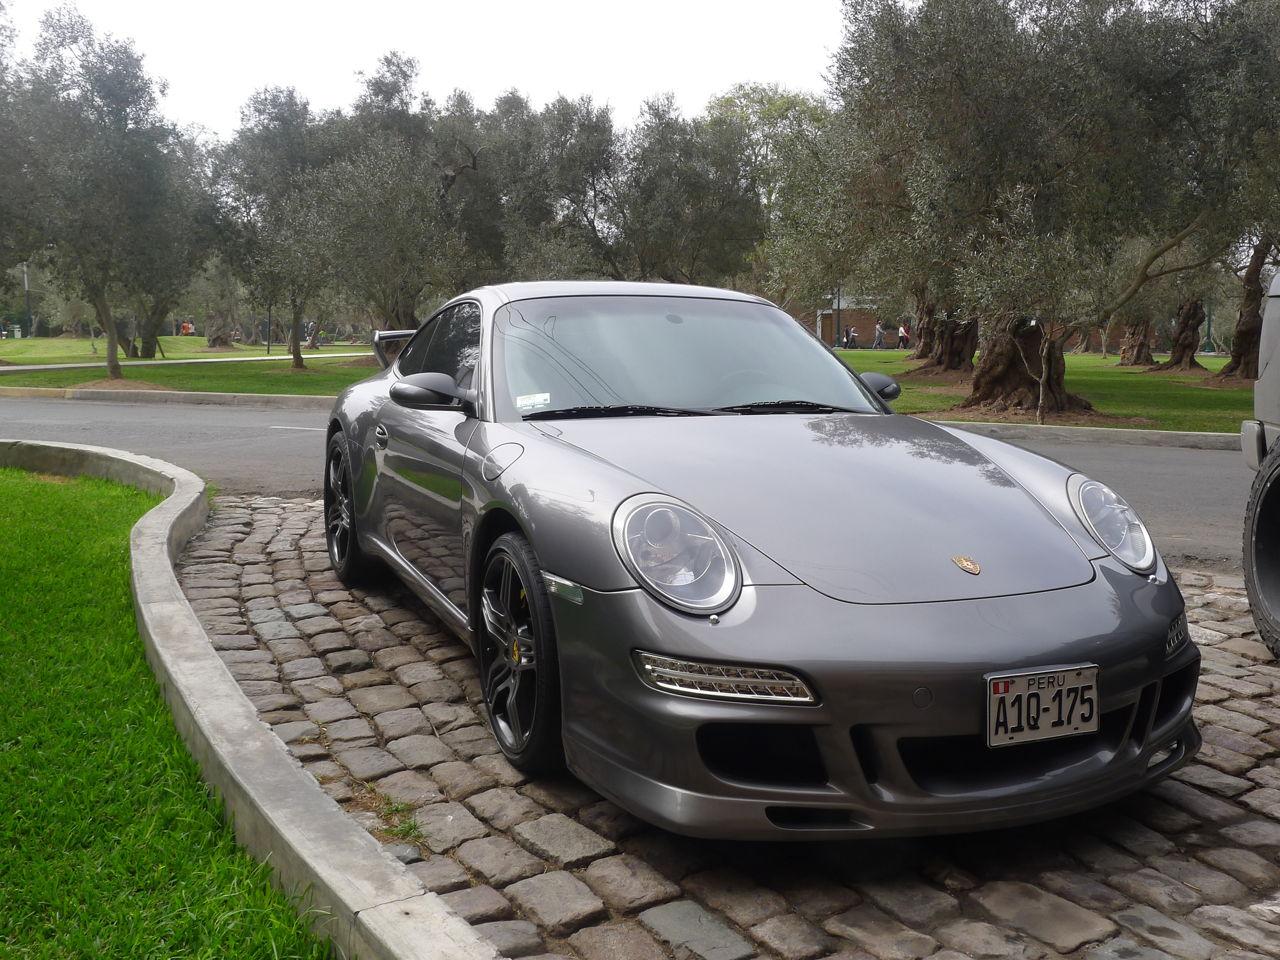 Gray Porsche Carrera S